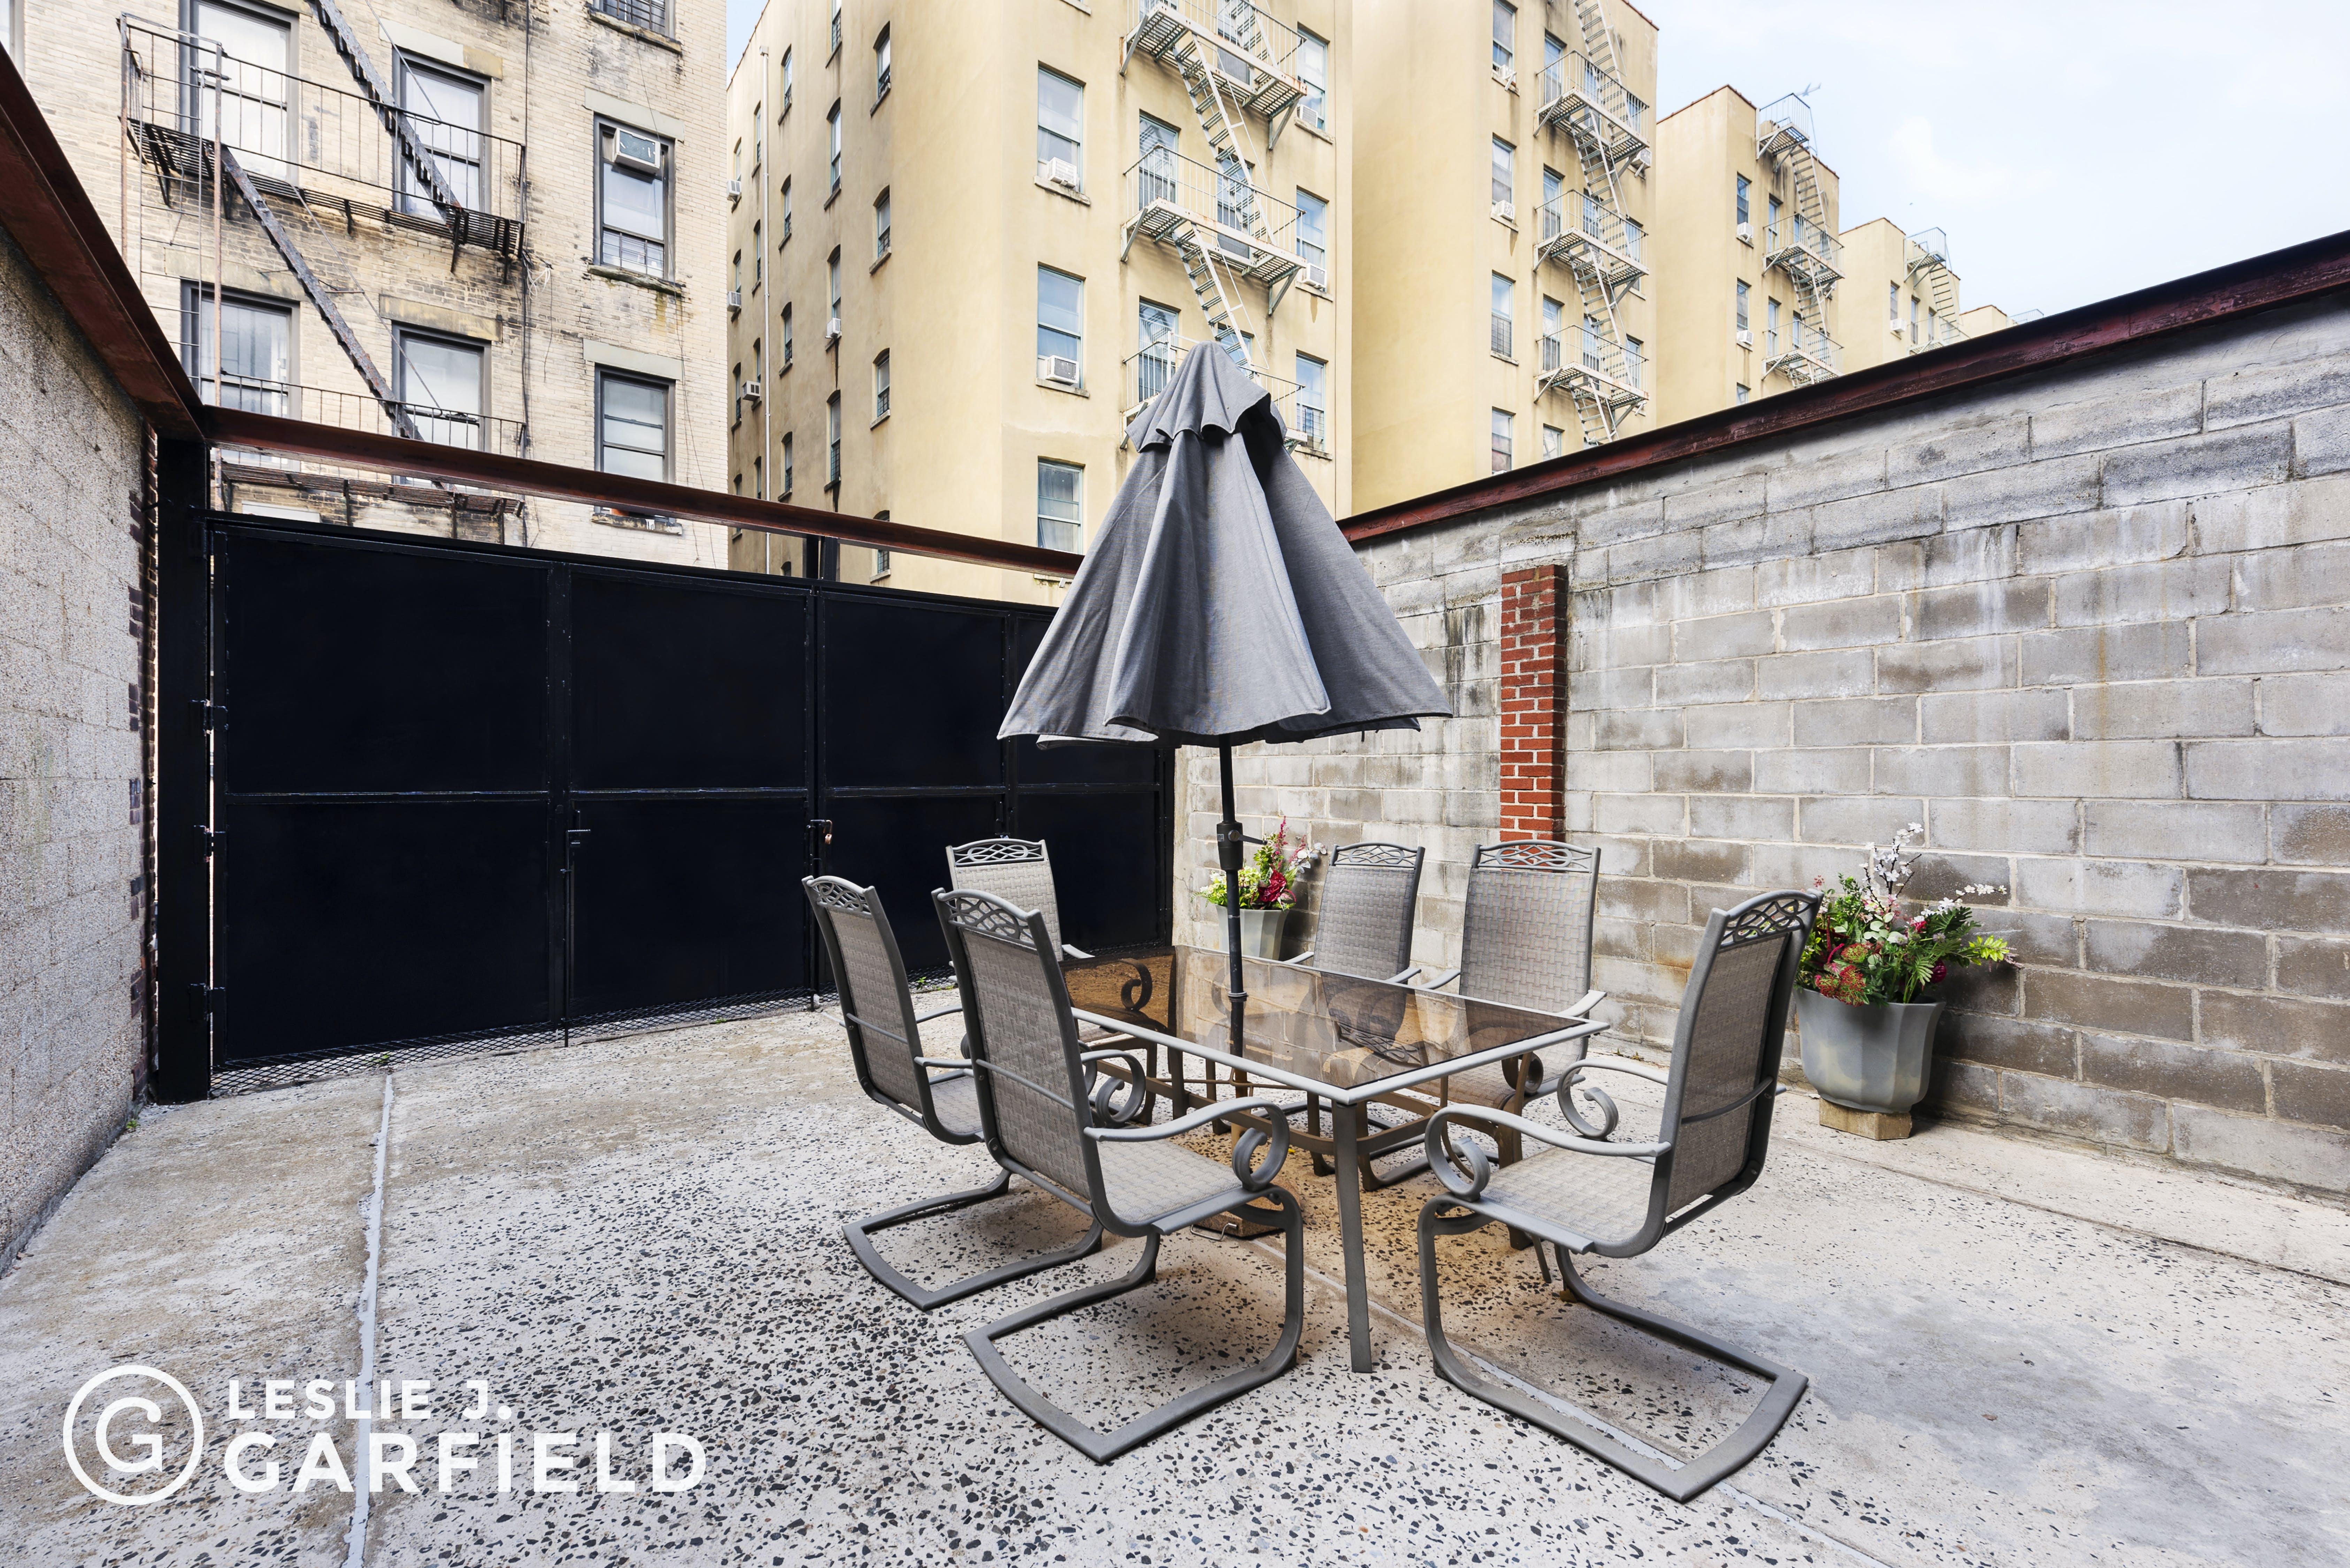 257 West 139th Street - 1dae02eb-dd72-426b-826d-0ece75c02207 - New York City Townhouse Real Estate